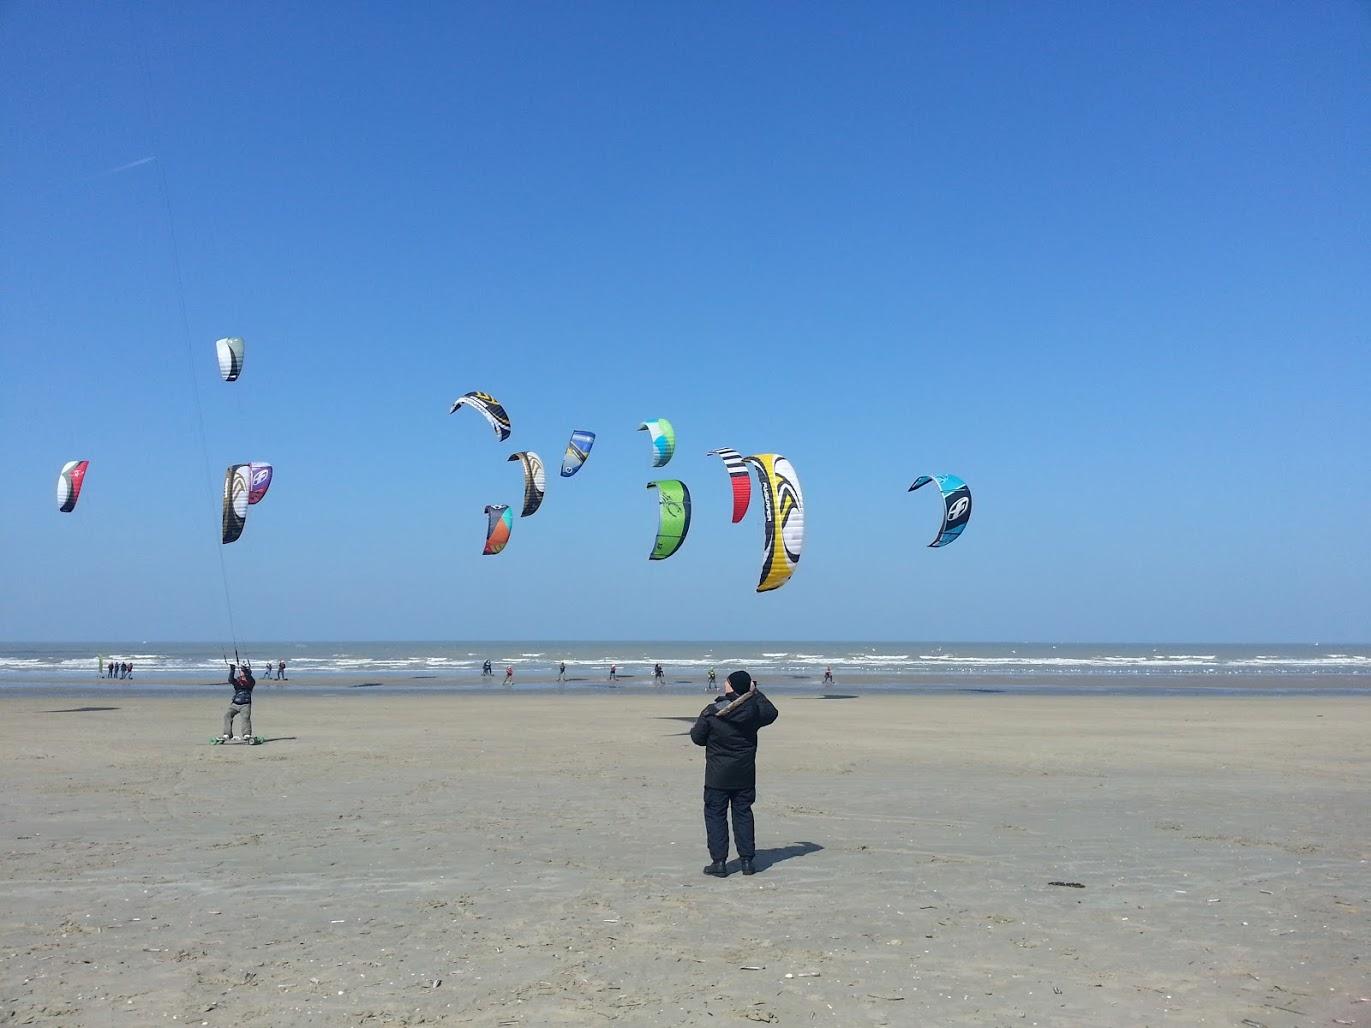 http://dfc-kiteboarding.fr/wp-content/uploads/2013/04/20130406_142128.jpg